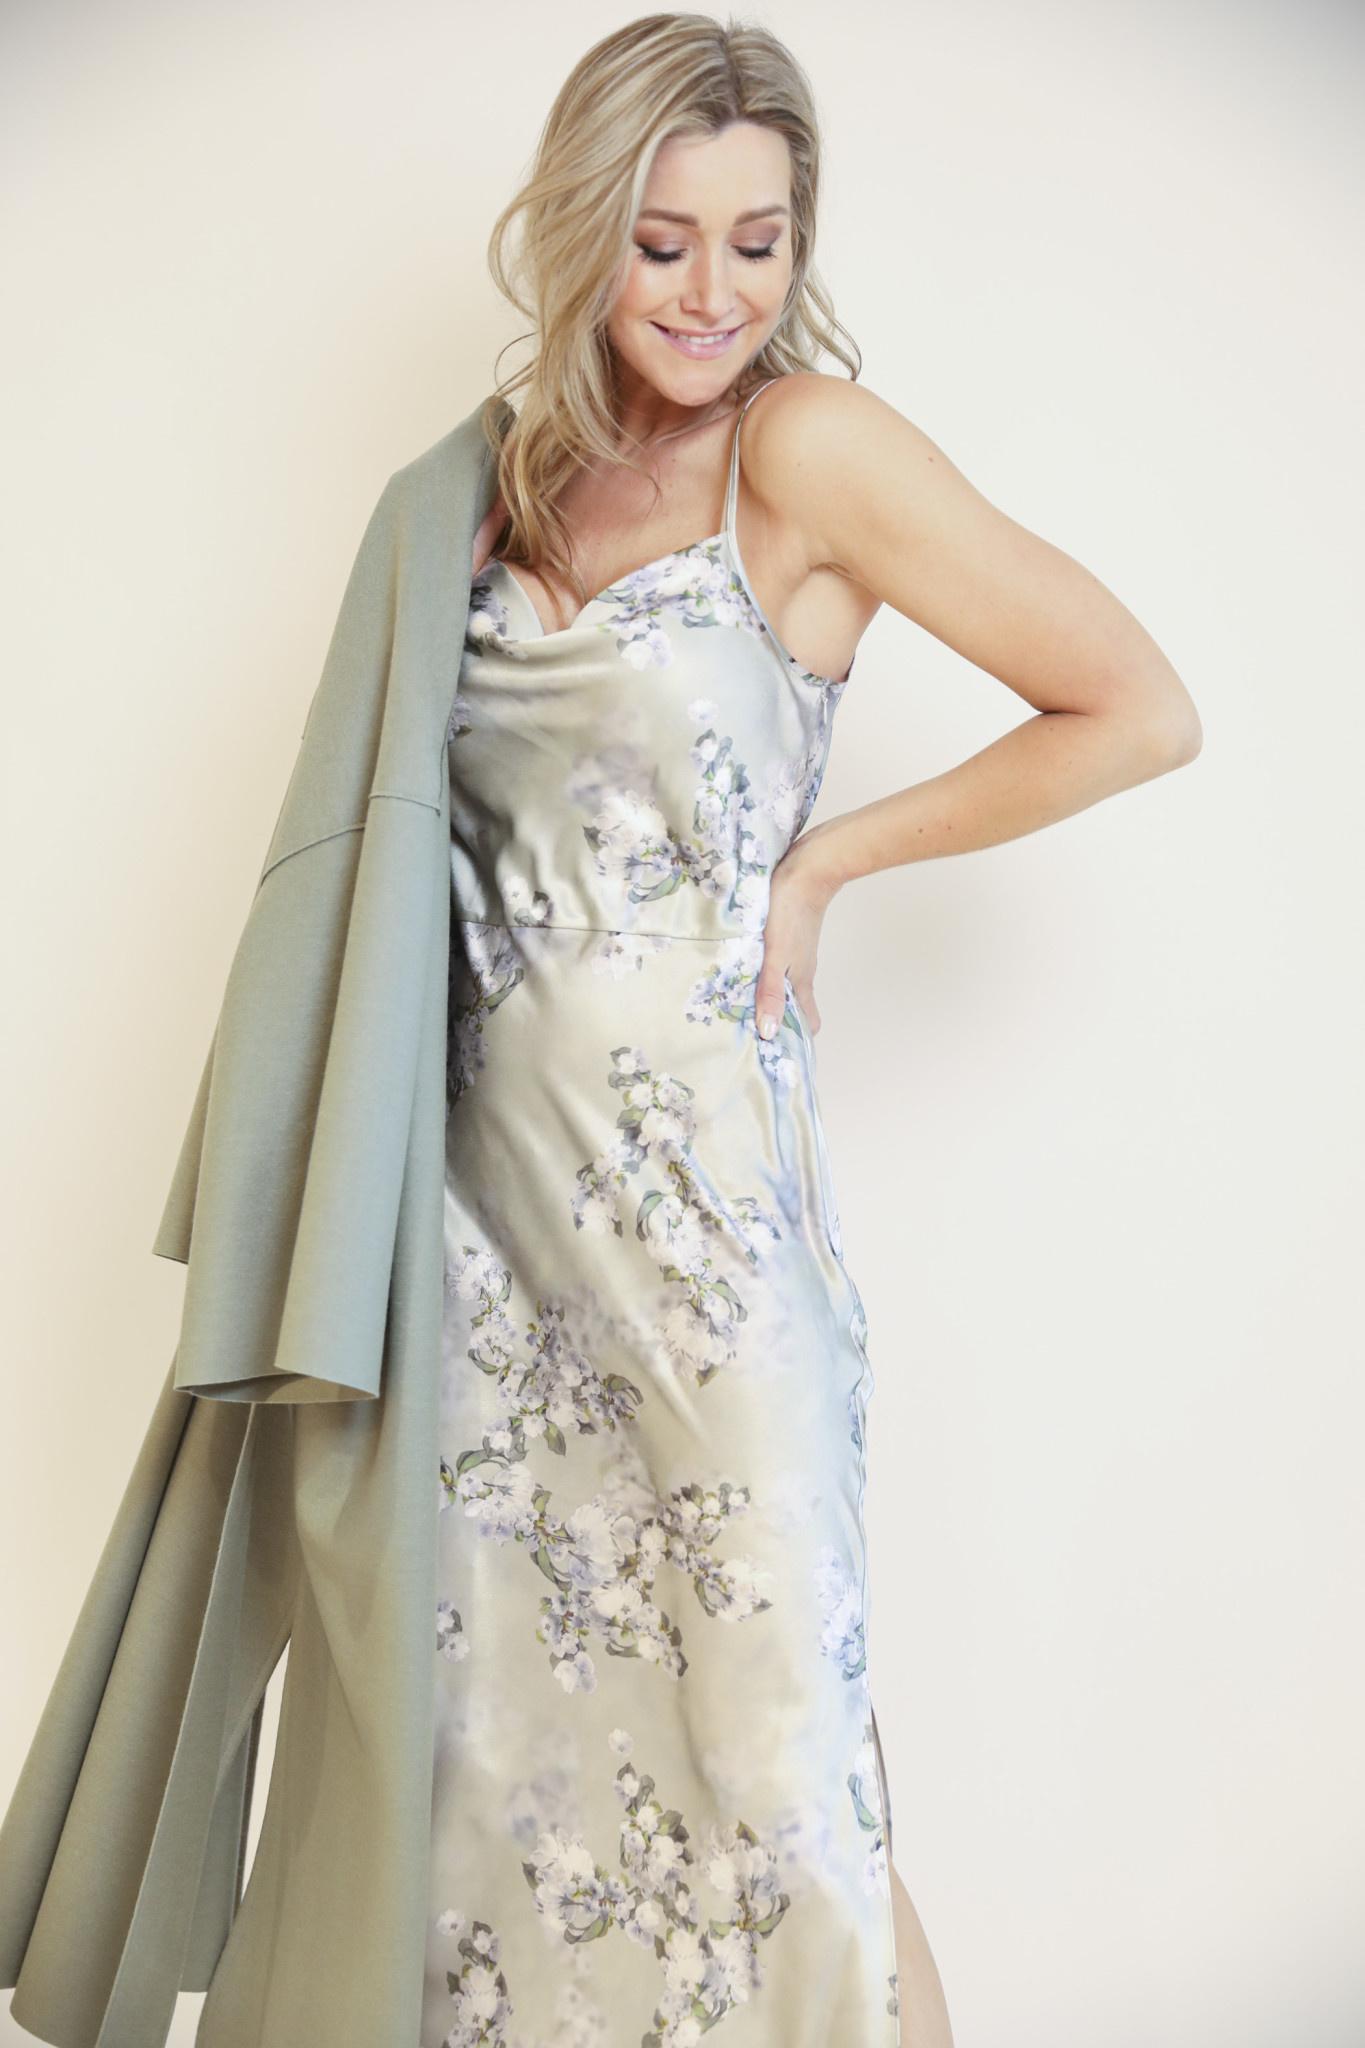 Hazy blossom cowl nk slip dress-2